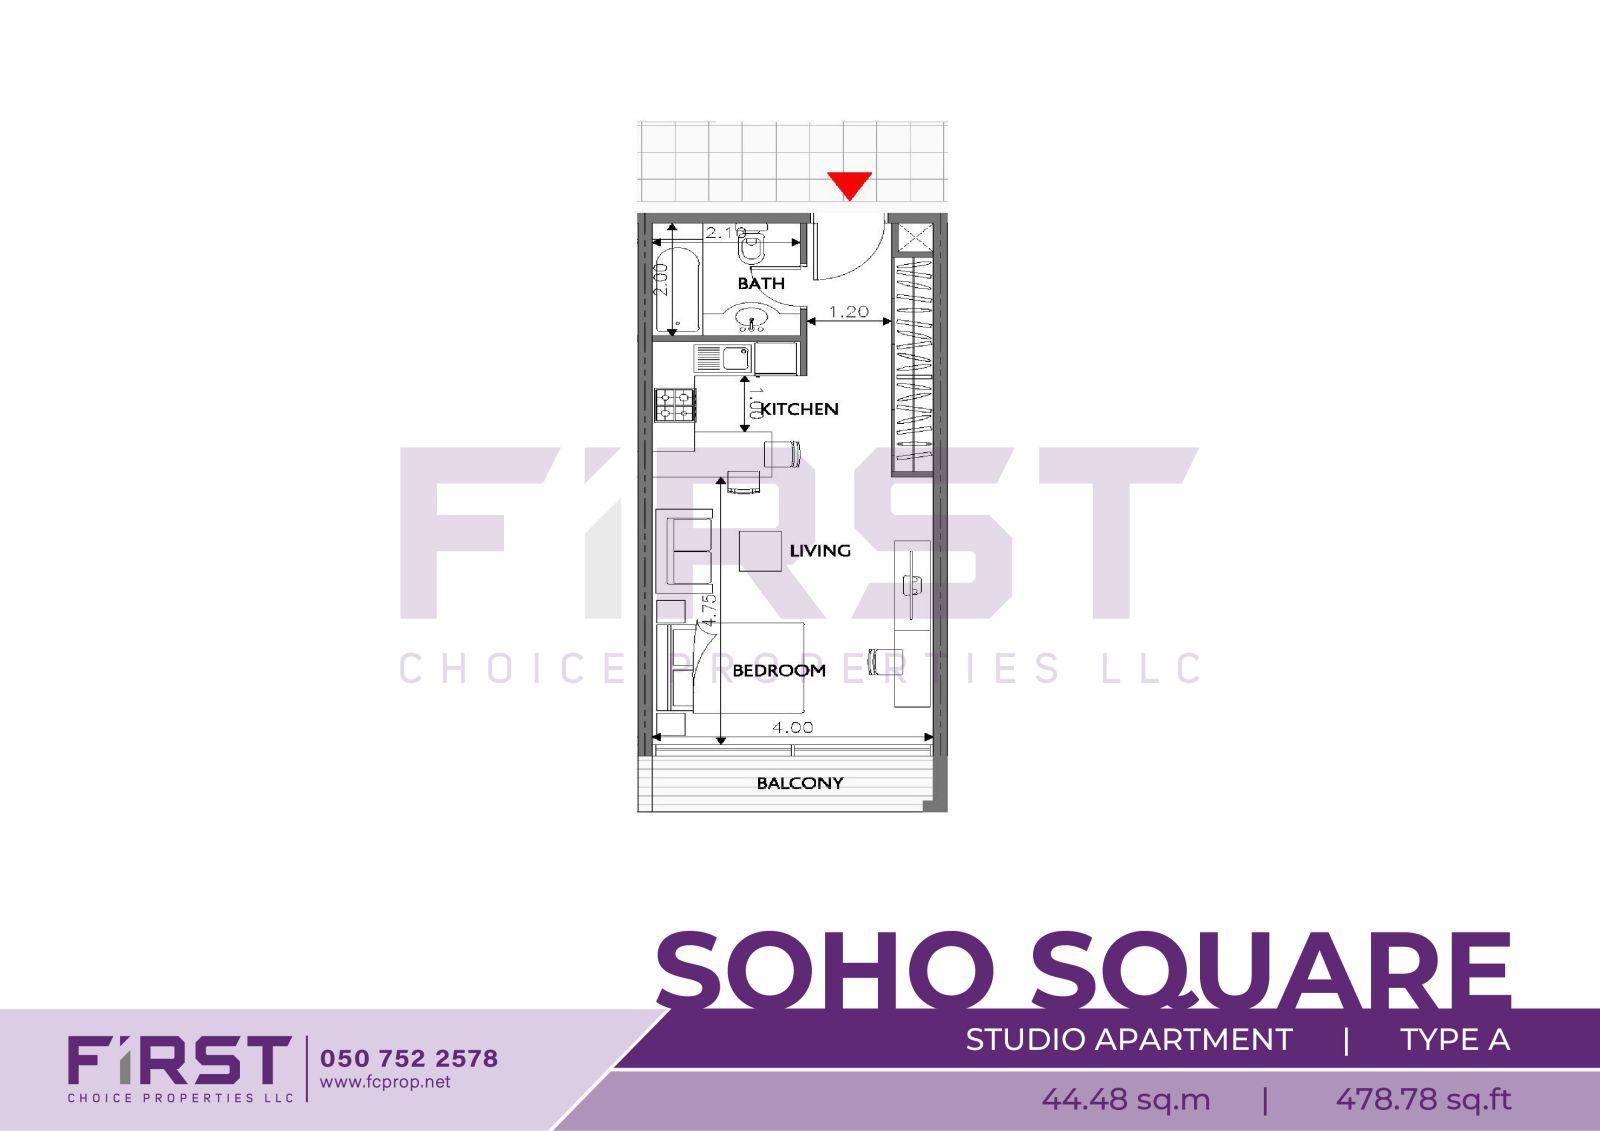 Floor Plan of Studio Apartment Type A in Soho Square Saadiyat Island Abu Dhabi UAE 44.48 sq.m 478.78 sq.ft.jpg